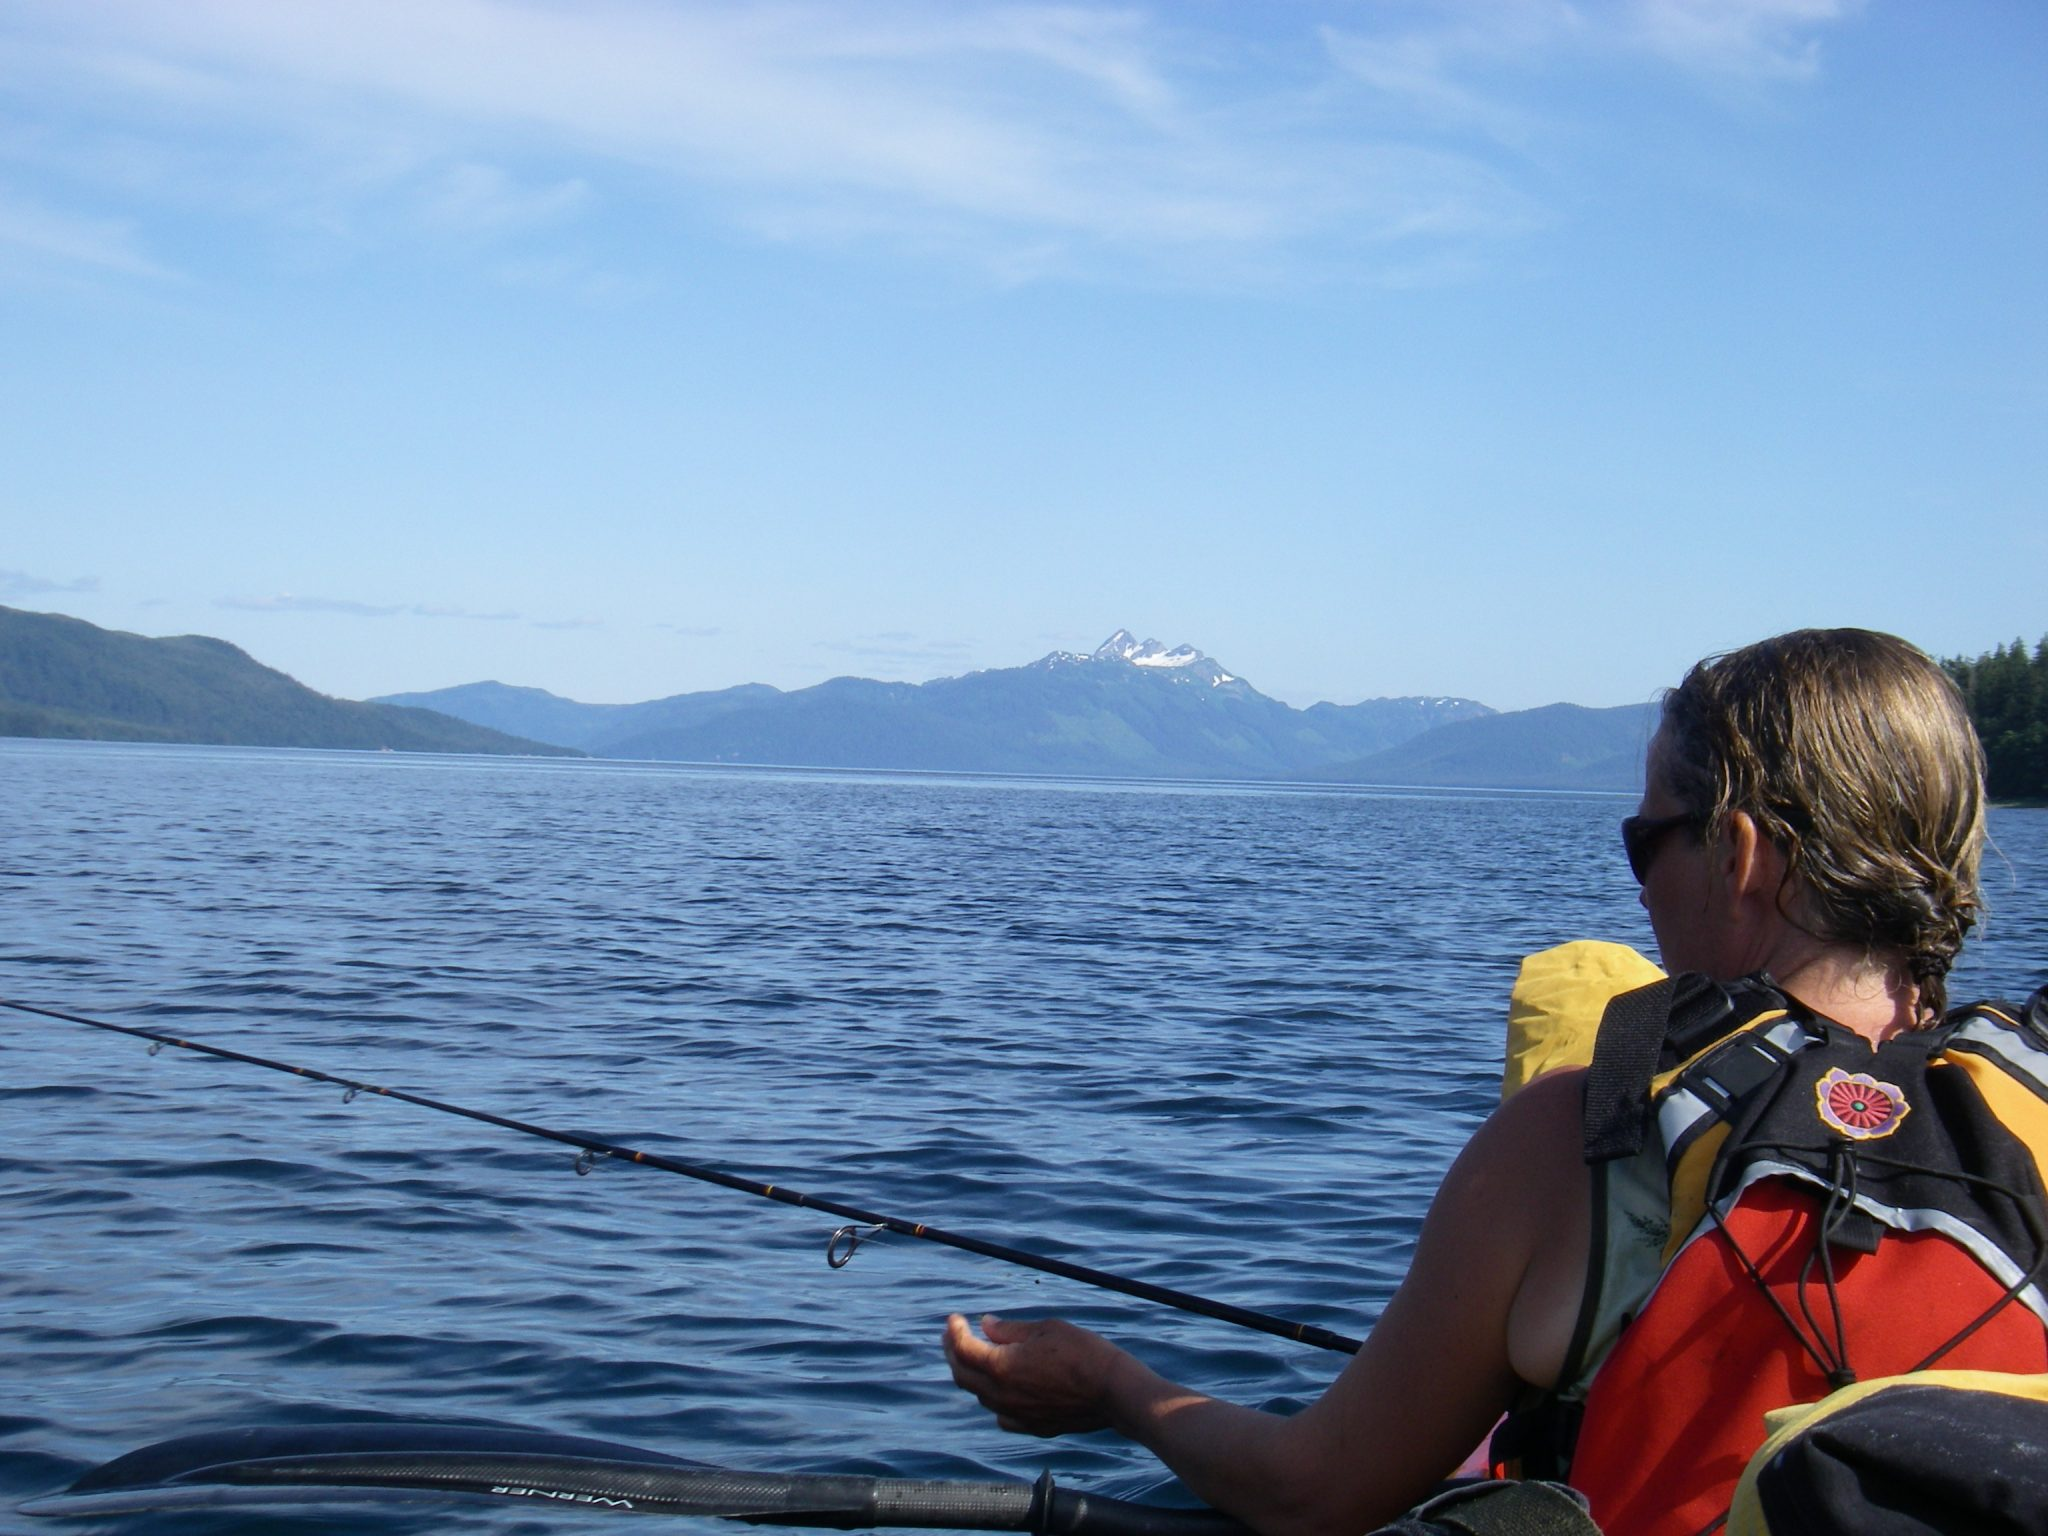 Single versus double sea kayak debate raven ecological blog for Double fishing kayak